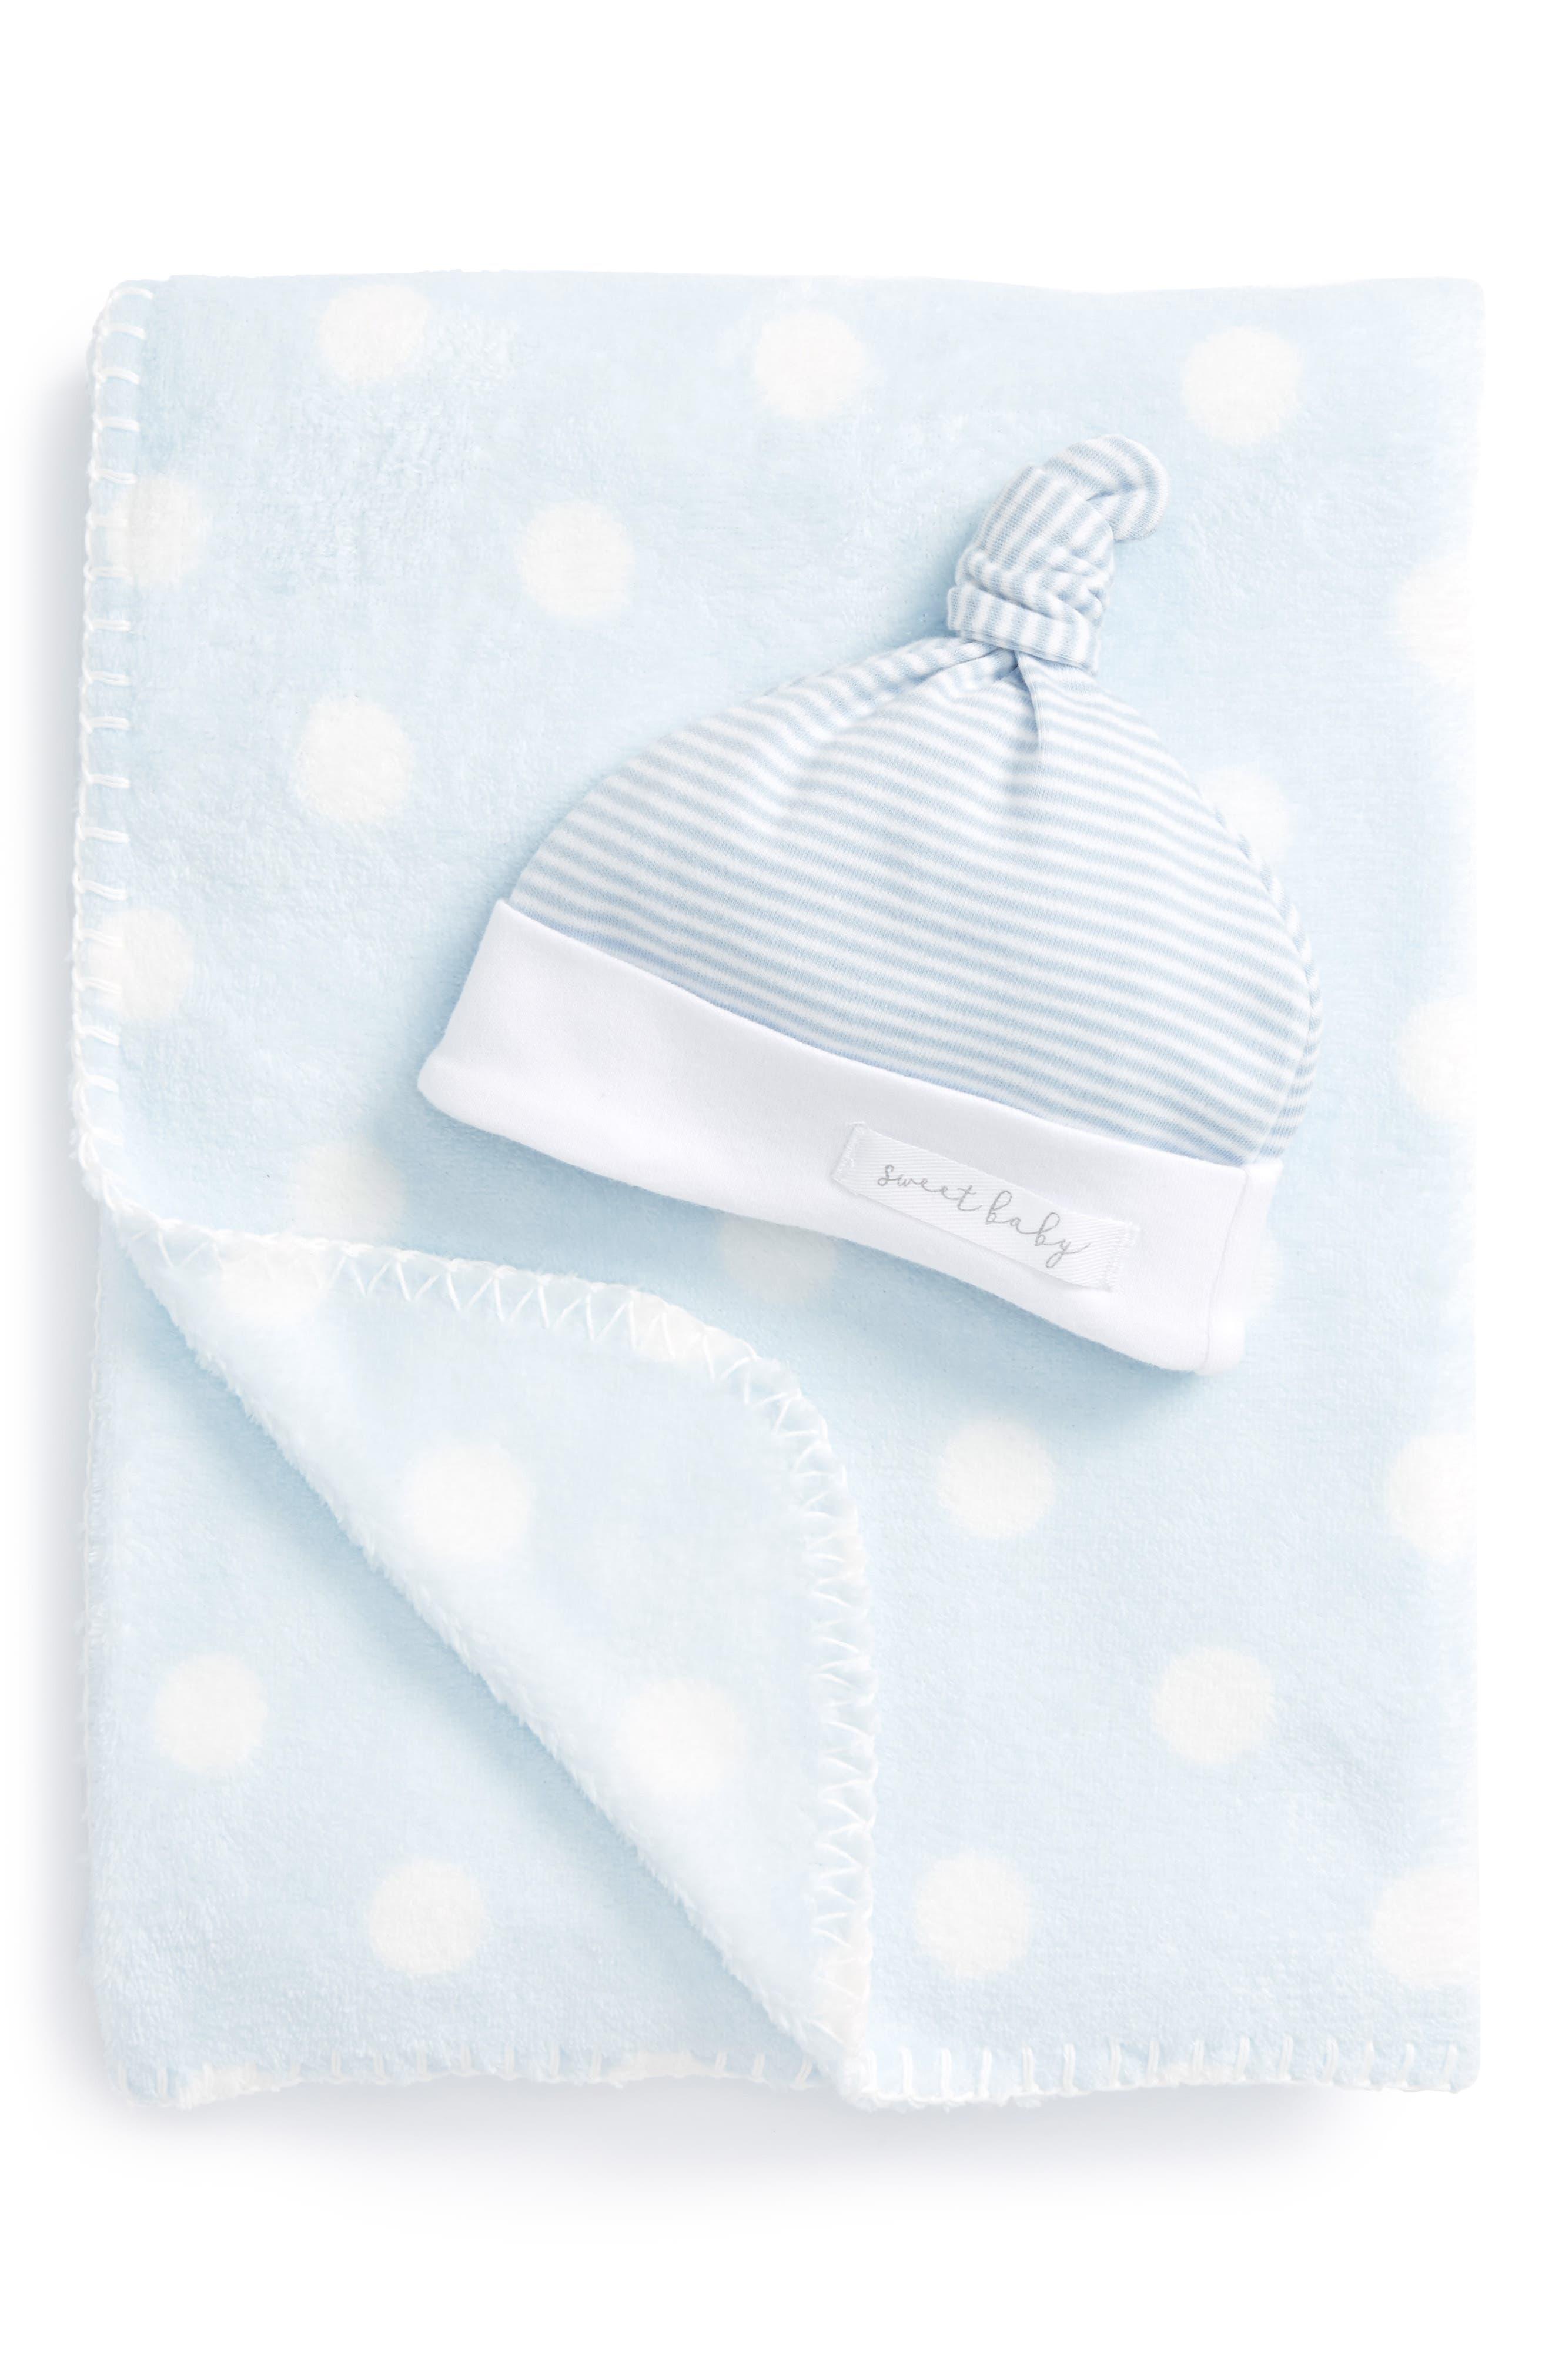 Sweet Baby Receiving Blanket & Hat Set,                             Main thumbnail 1, color,                             Blue